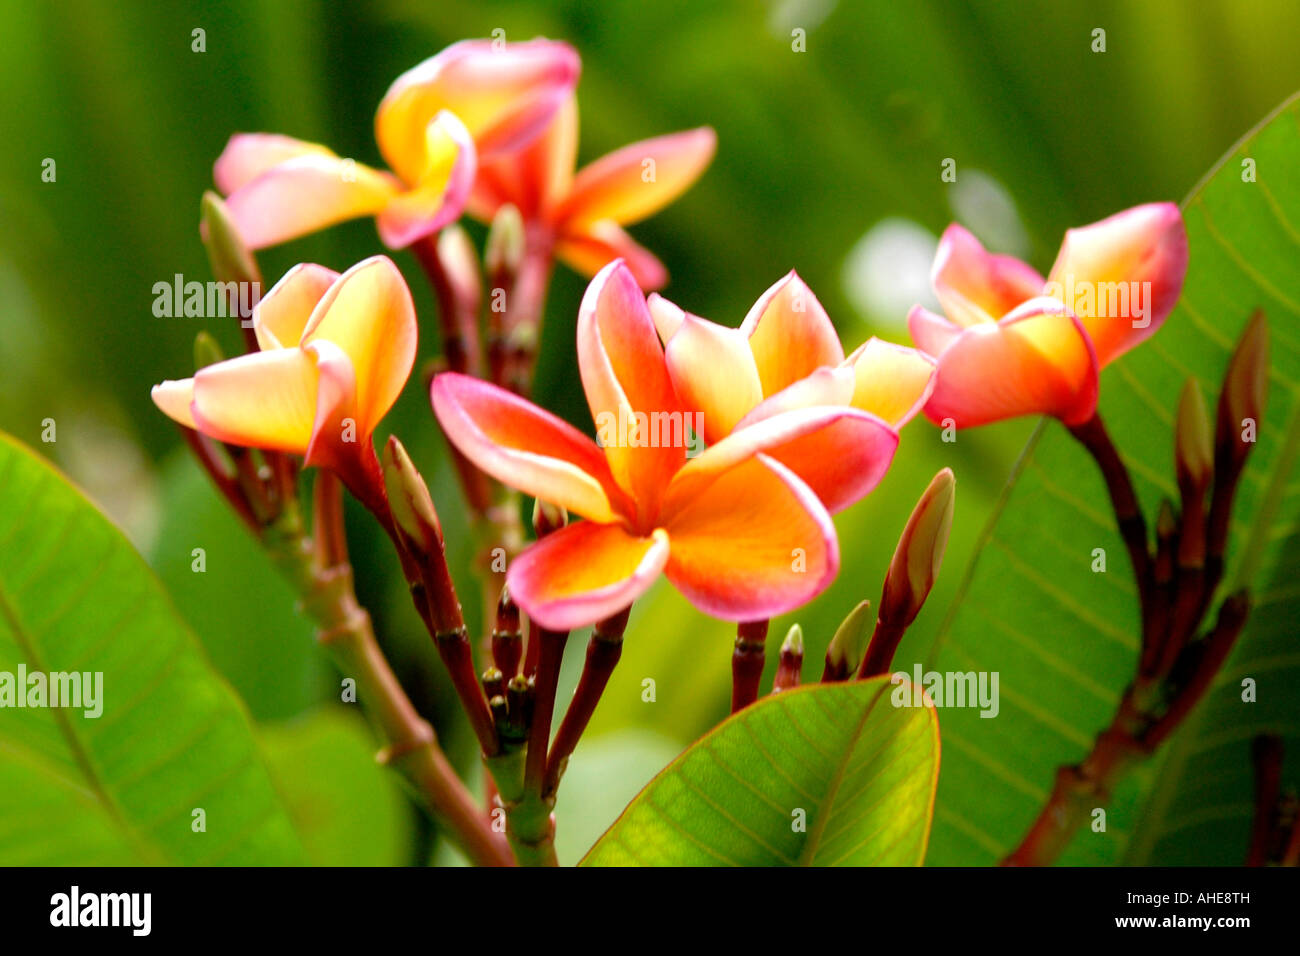 Vietnam Hanoi Flowers IV Close Up Of Exotic Yellow And Orange Flower On Tree